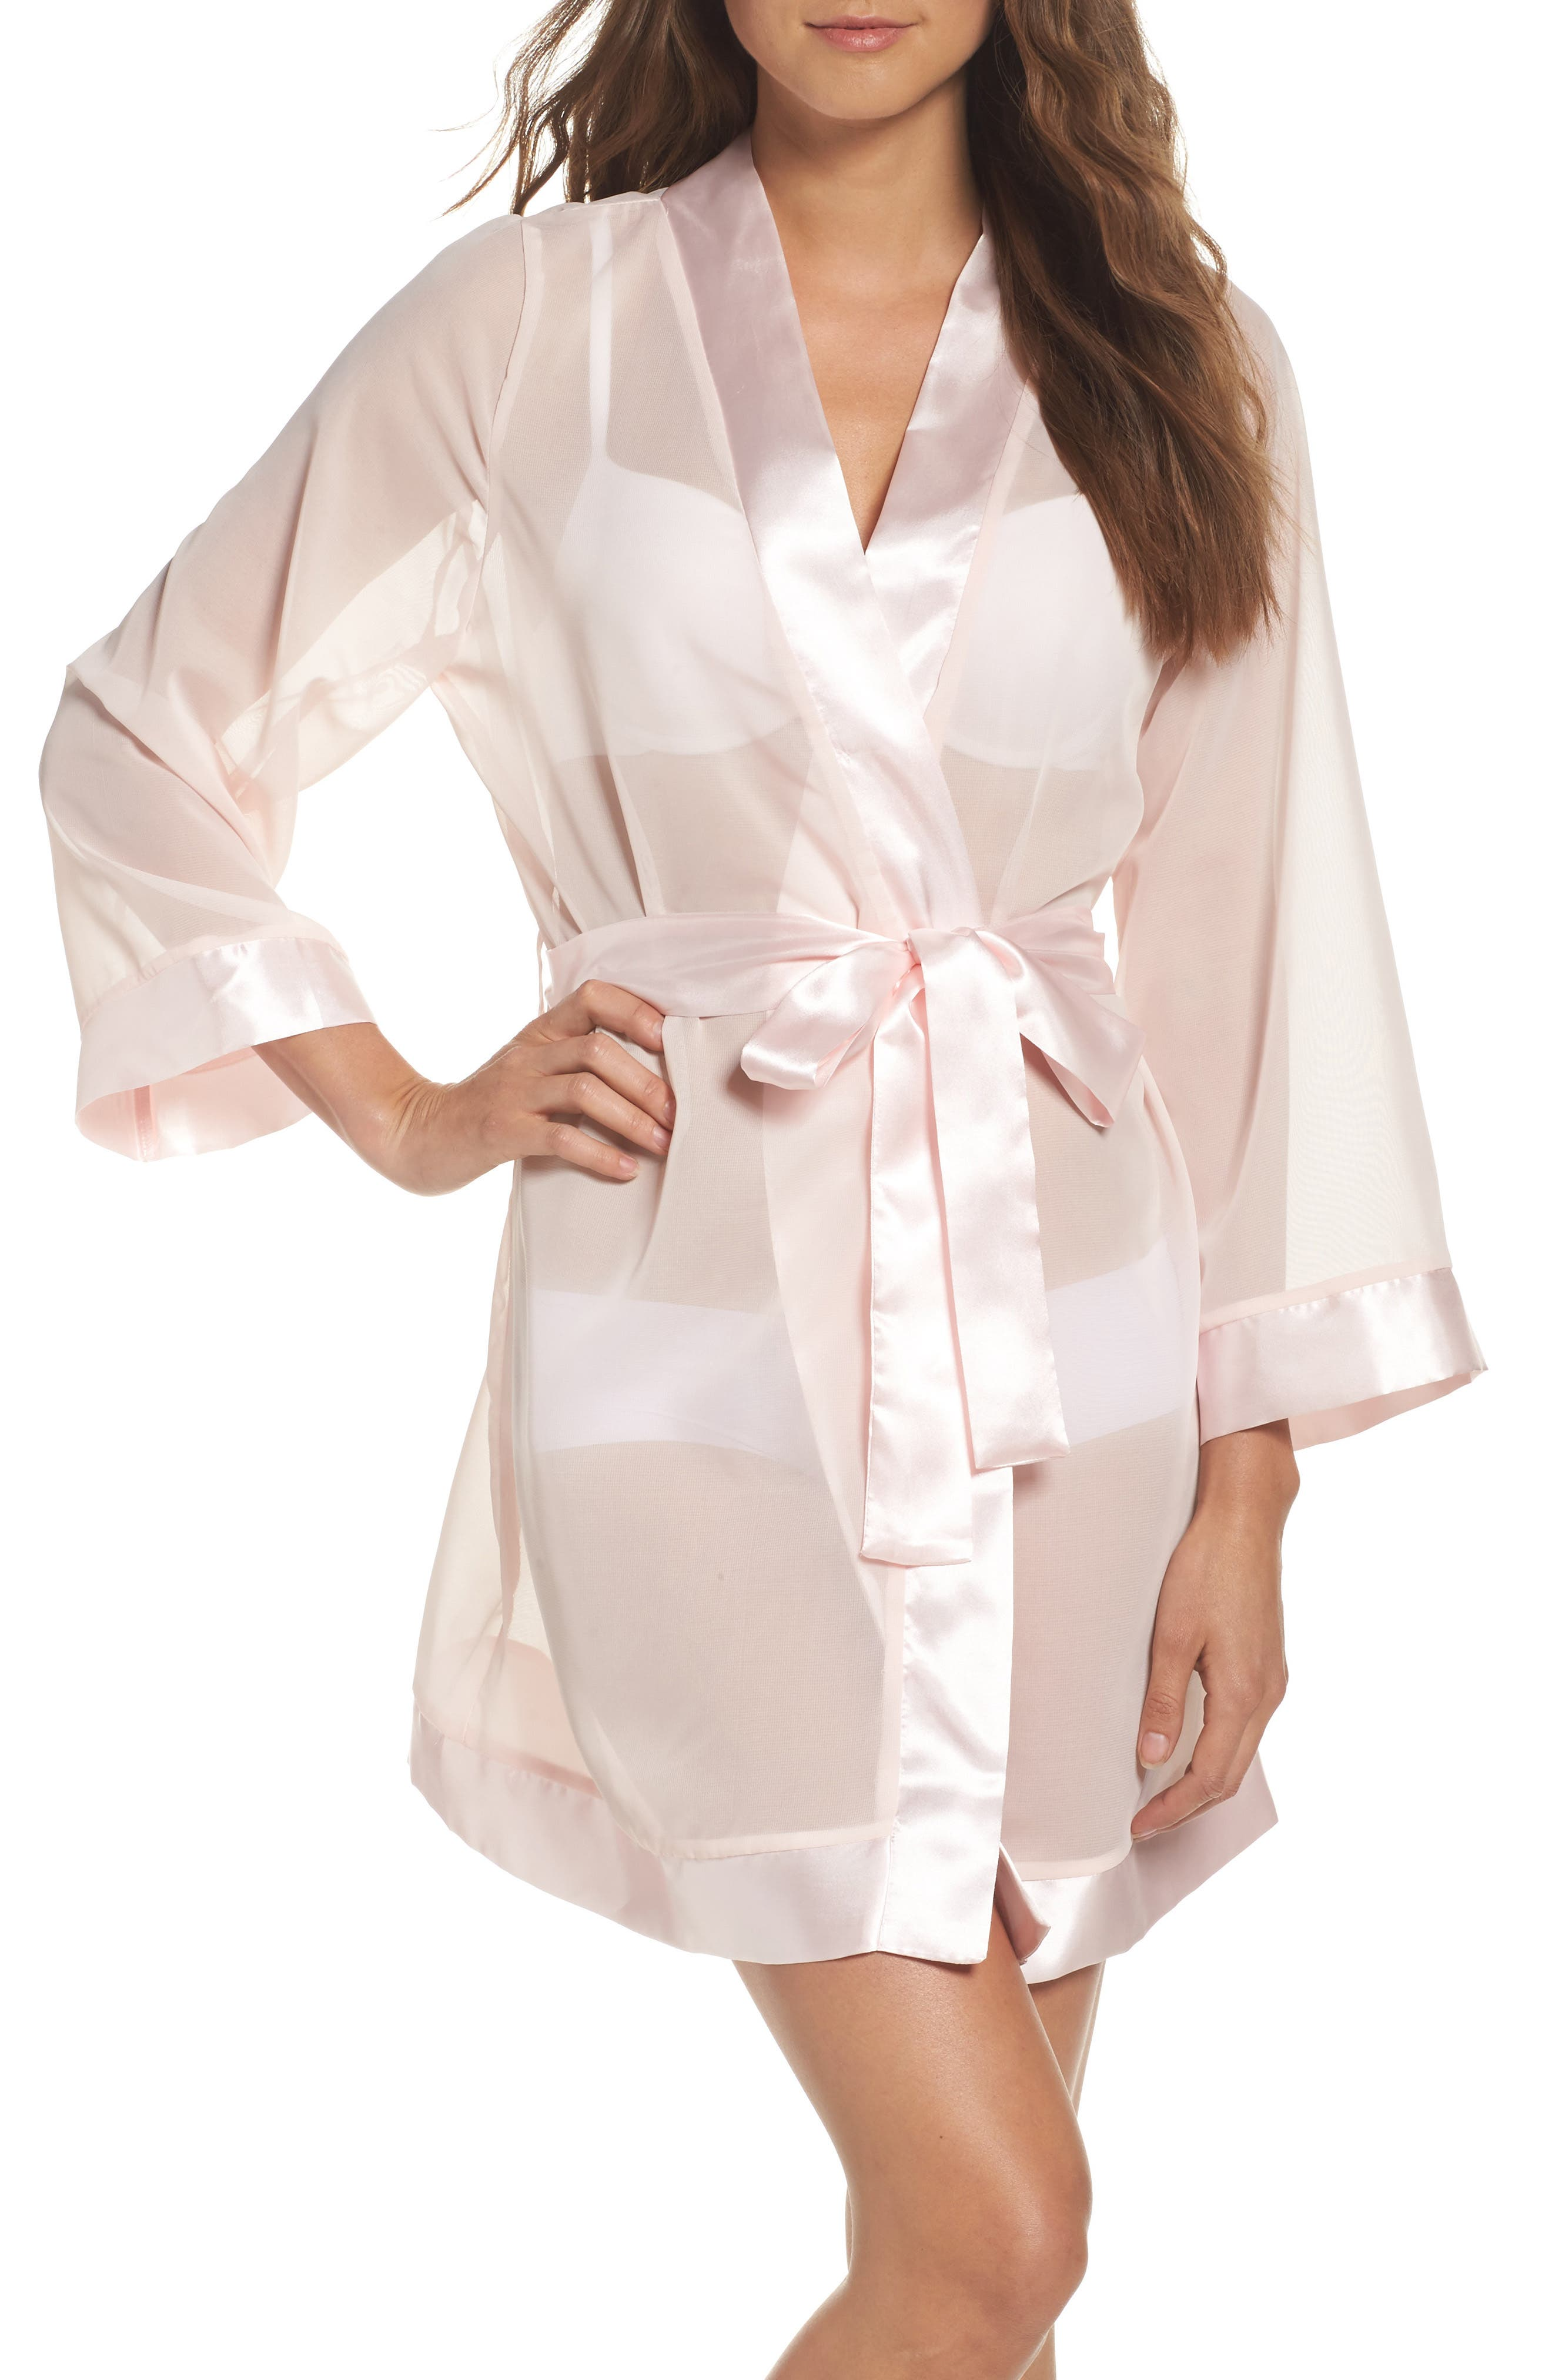 Bluebella Chiffon & Satin Kimono